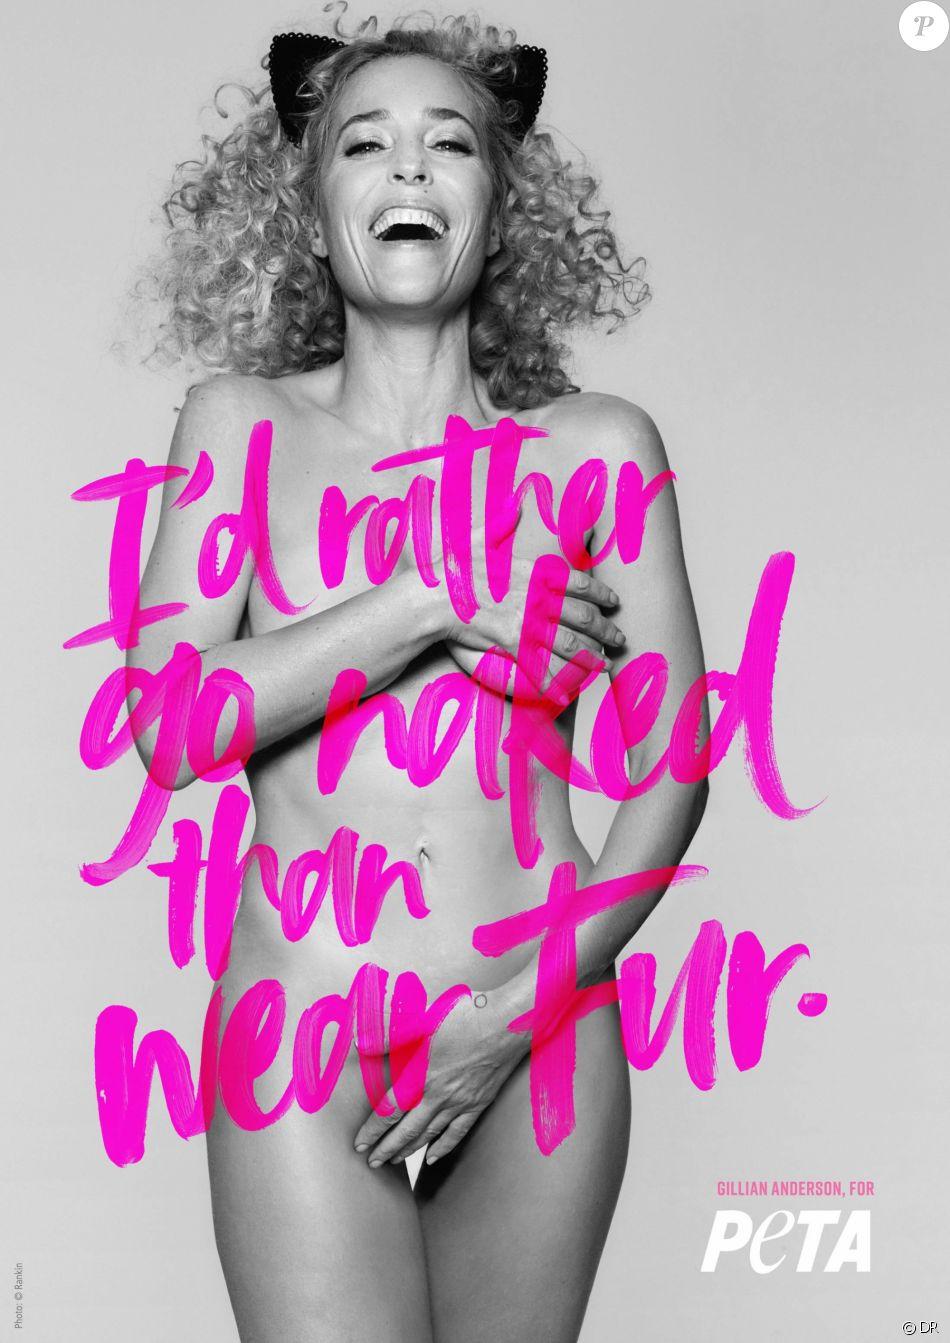 Gillian Anderson, nue pour la campagne anti-fourrure de la PETA. Photo par Rankin.